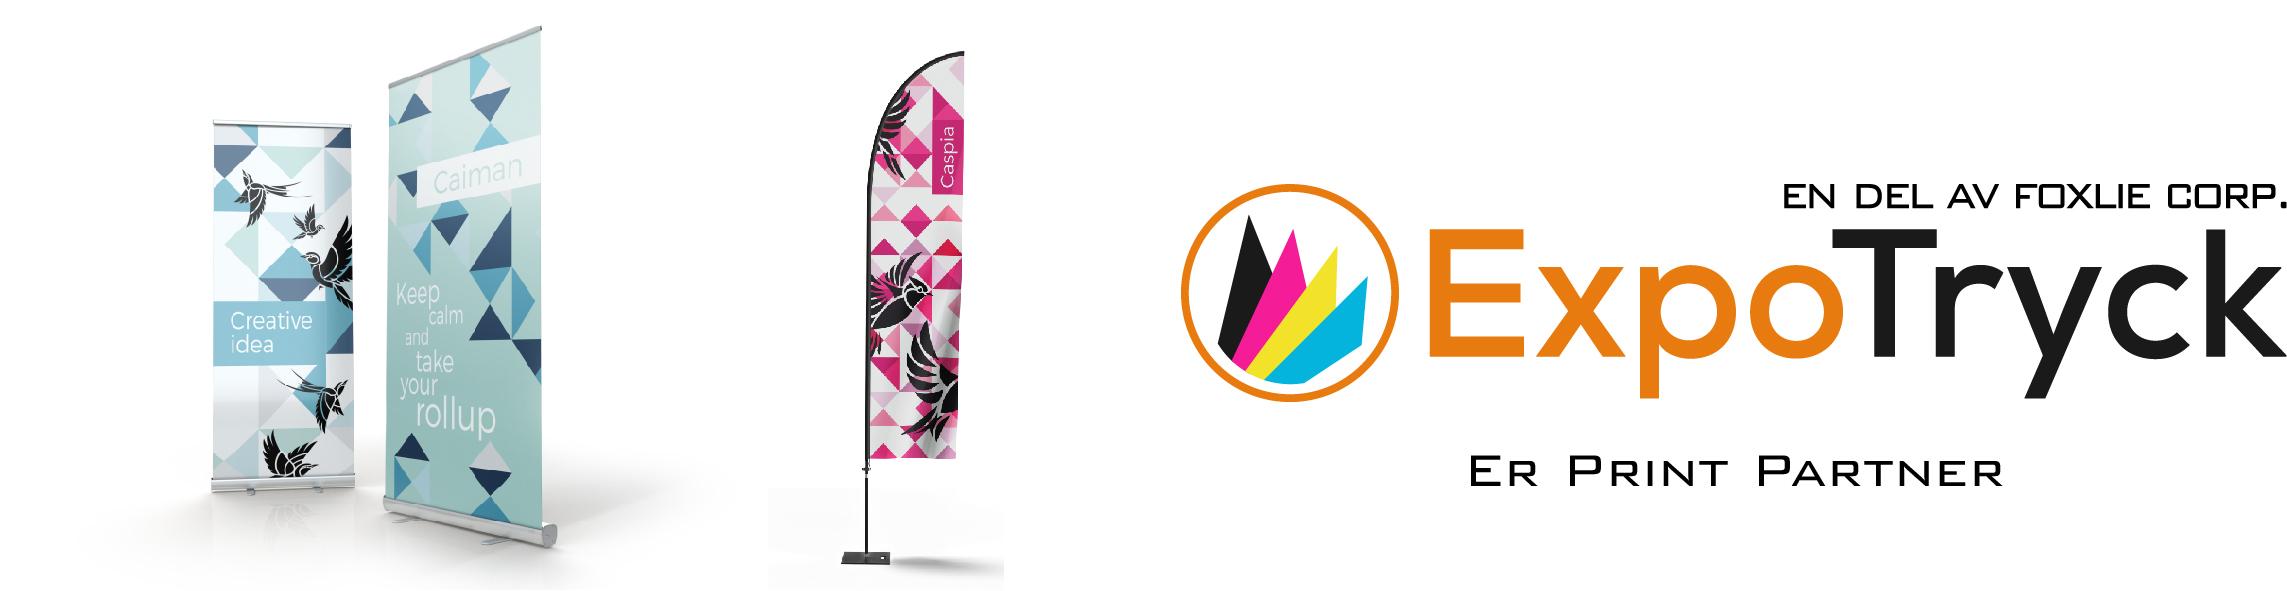 ExpoTryck.se, print, tryck, expo, produkter, eget motiv, logotyp